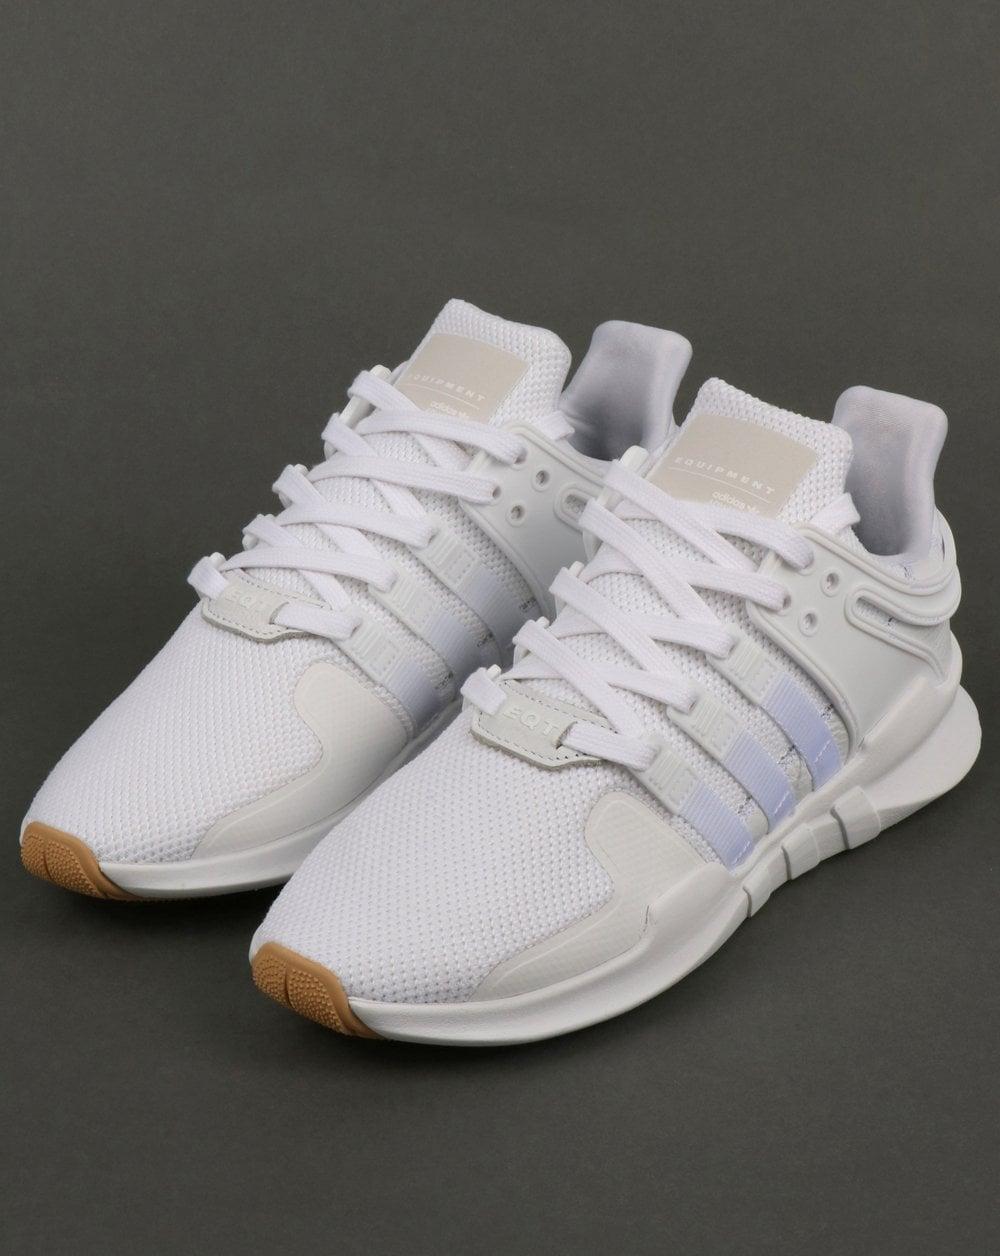 super popular 2c40a ab4ec Adidas EQT Support Adv Trainers White/White/Gum